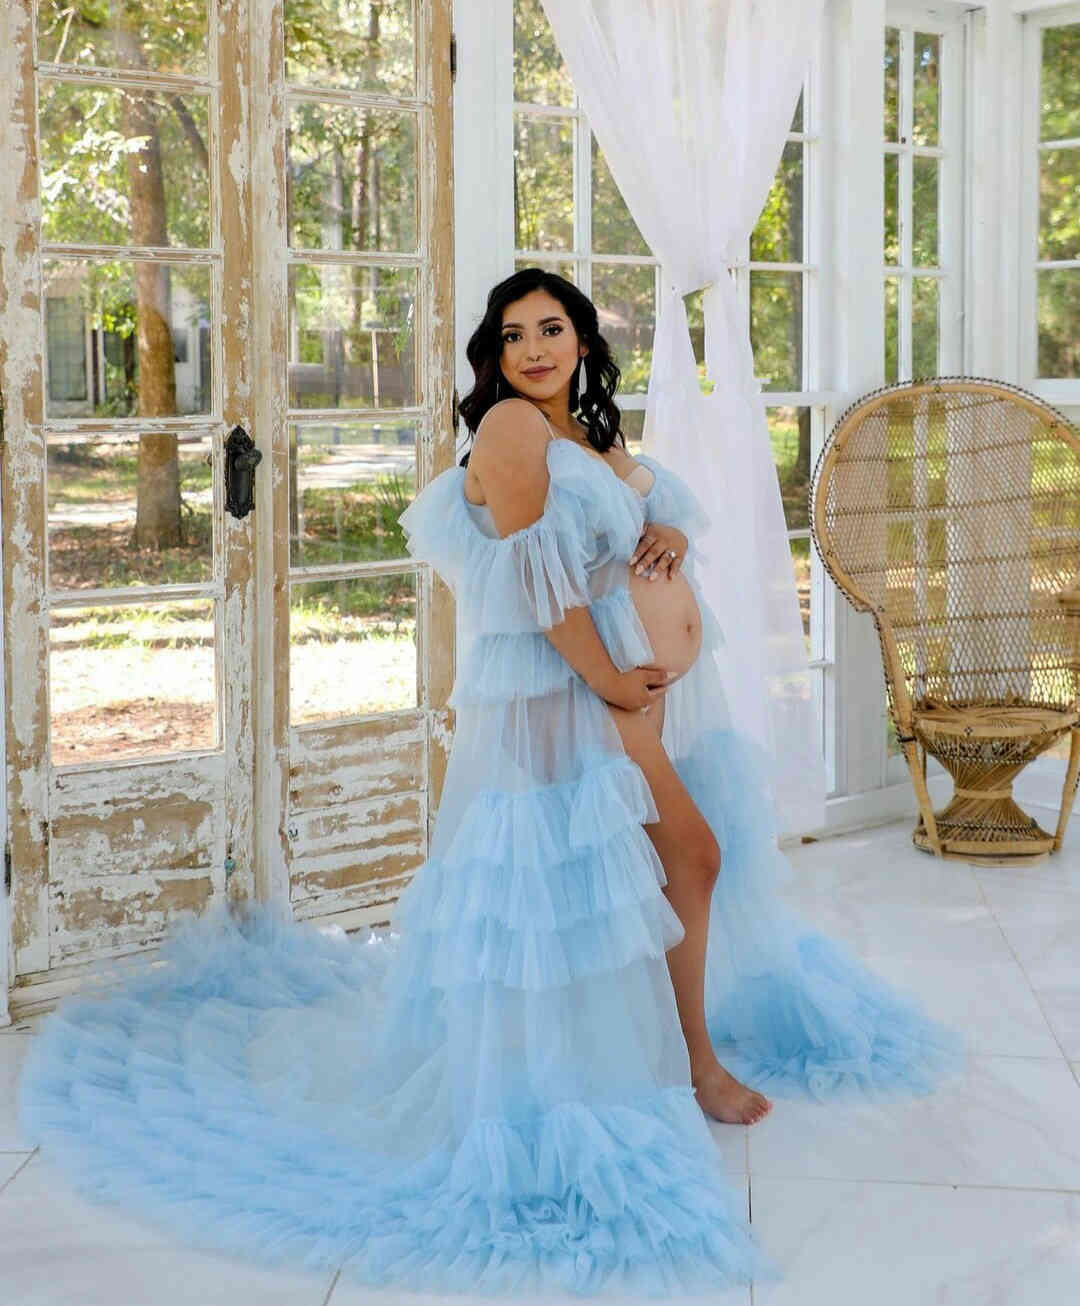 Light Blue Spaghetti Evening Dresses Tulle Ruffles Front Split Off Shoulder Prom Gowns for Pregnant Women vestido de novia